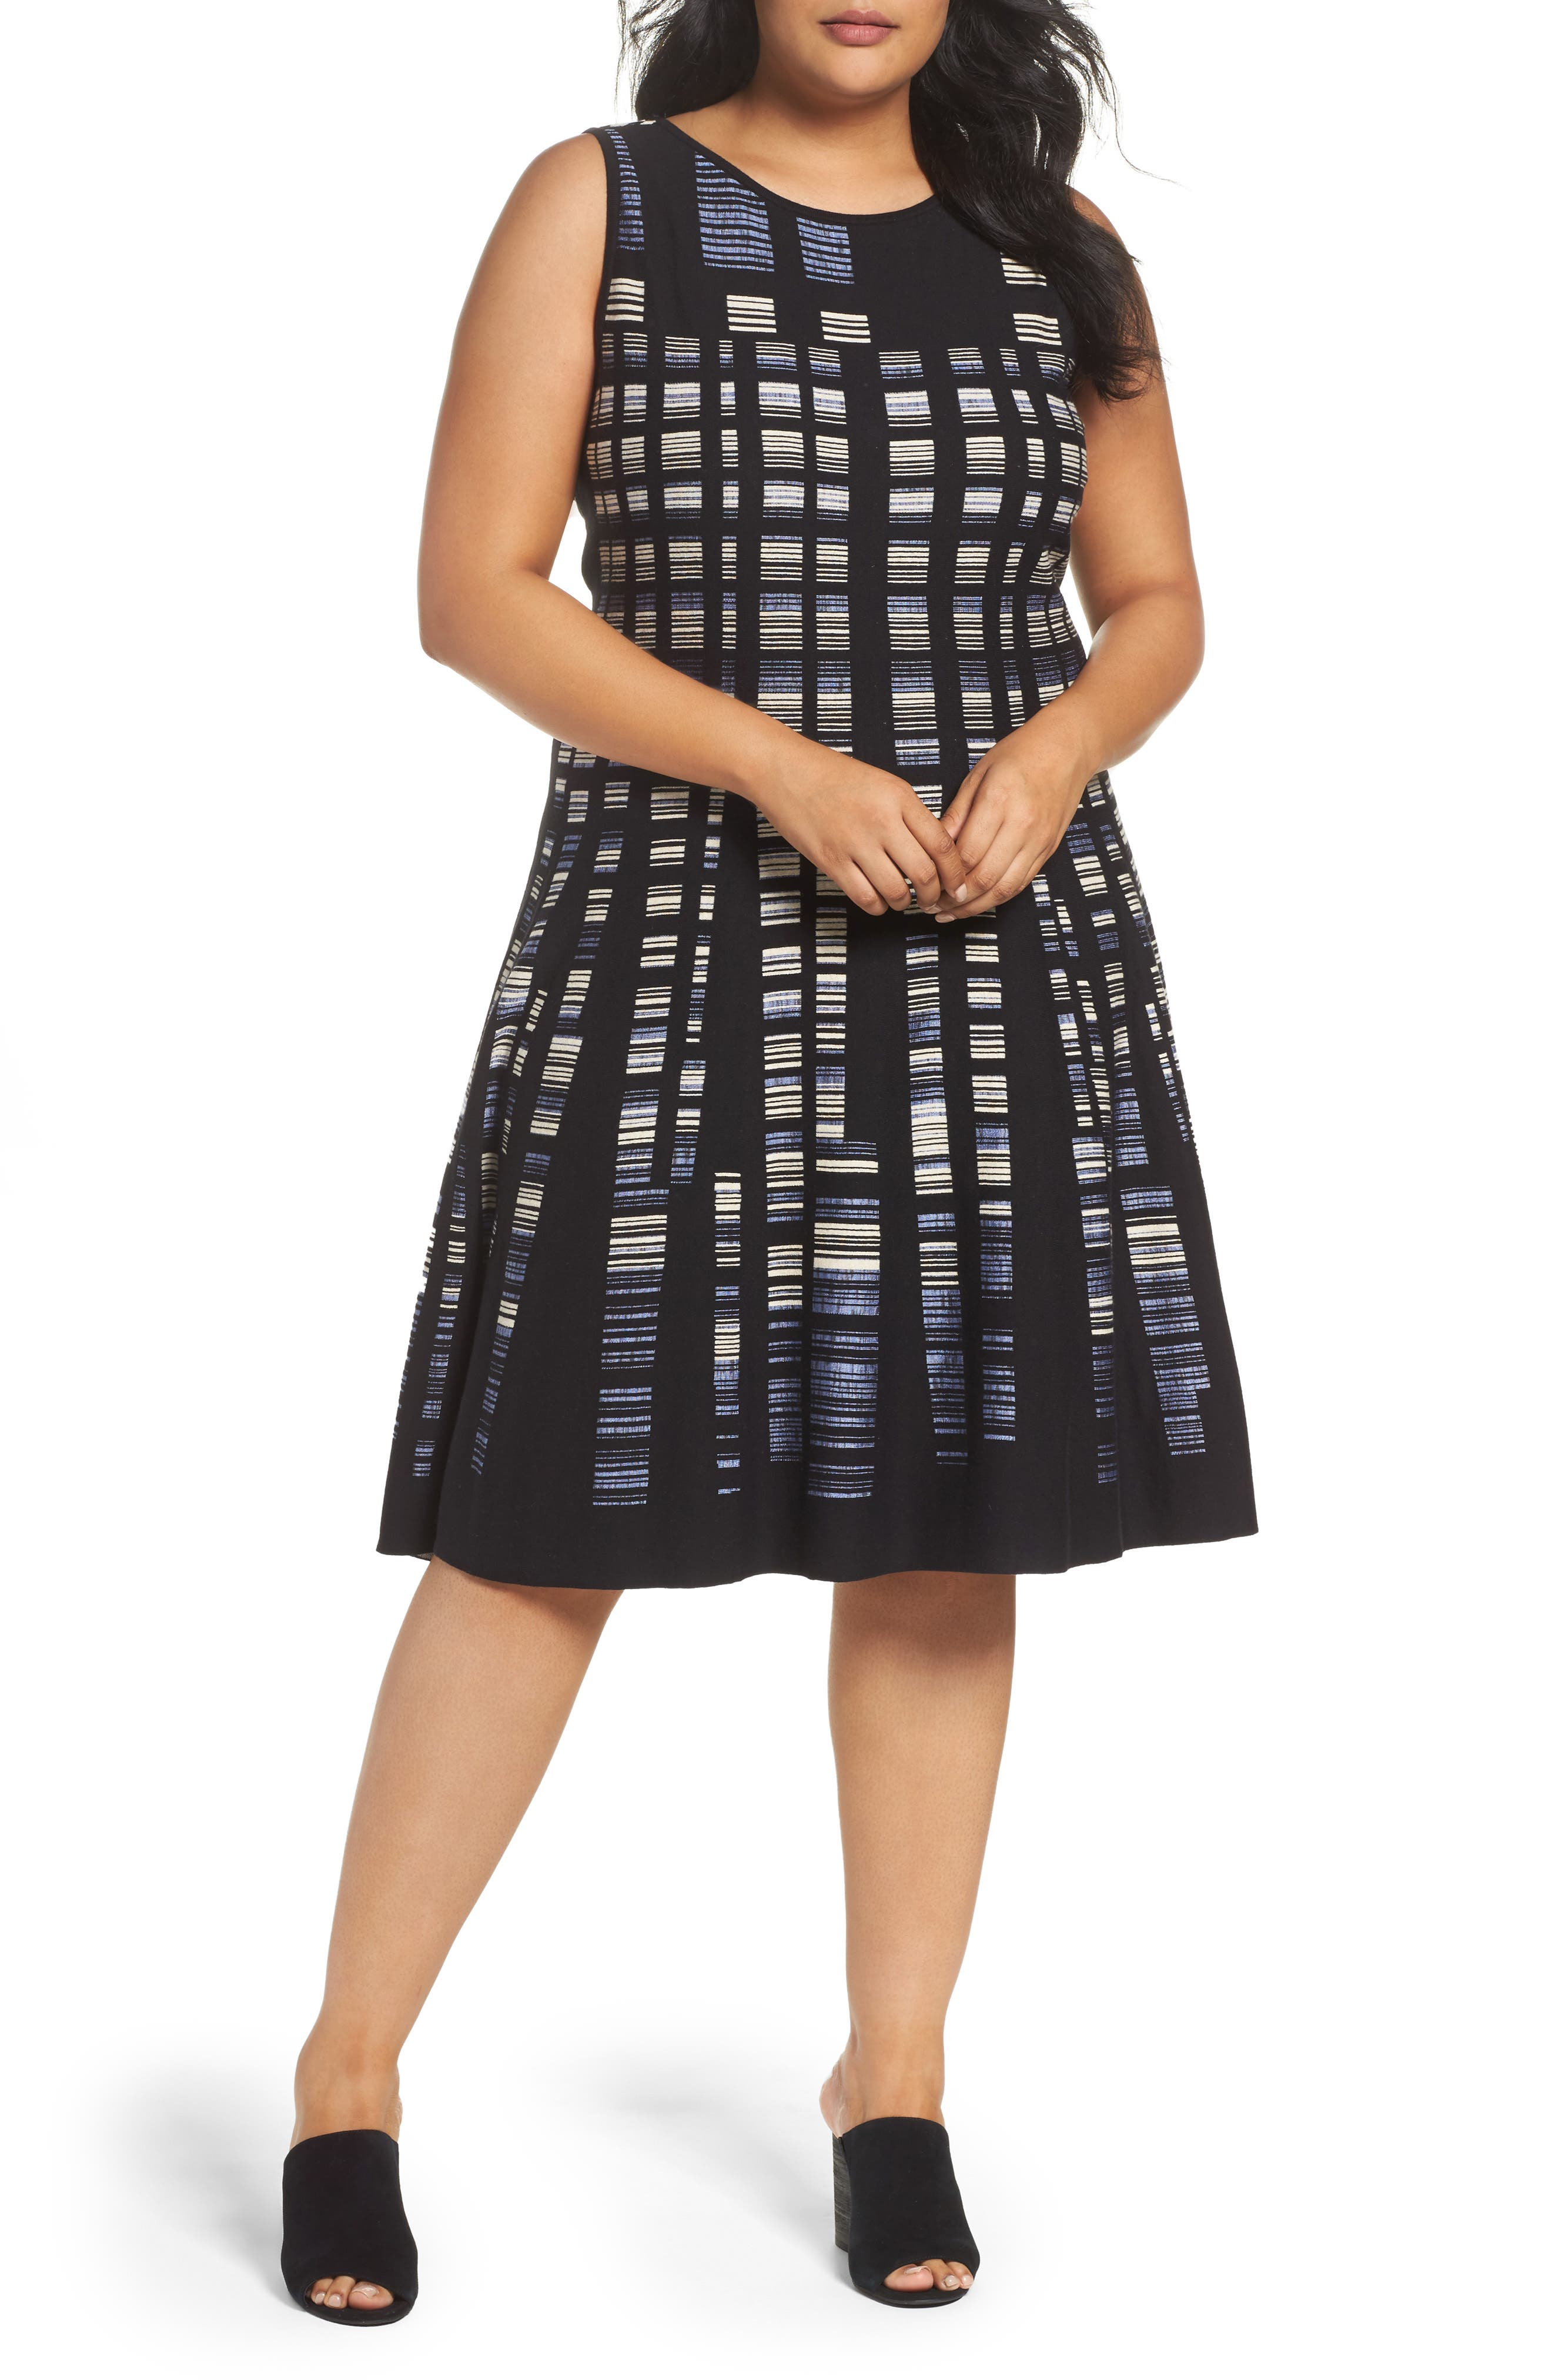 NIC + ZOE Crystal Cove Sleeveless Knit Dress (Plus Size)